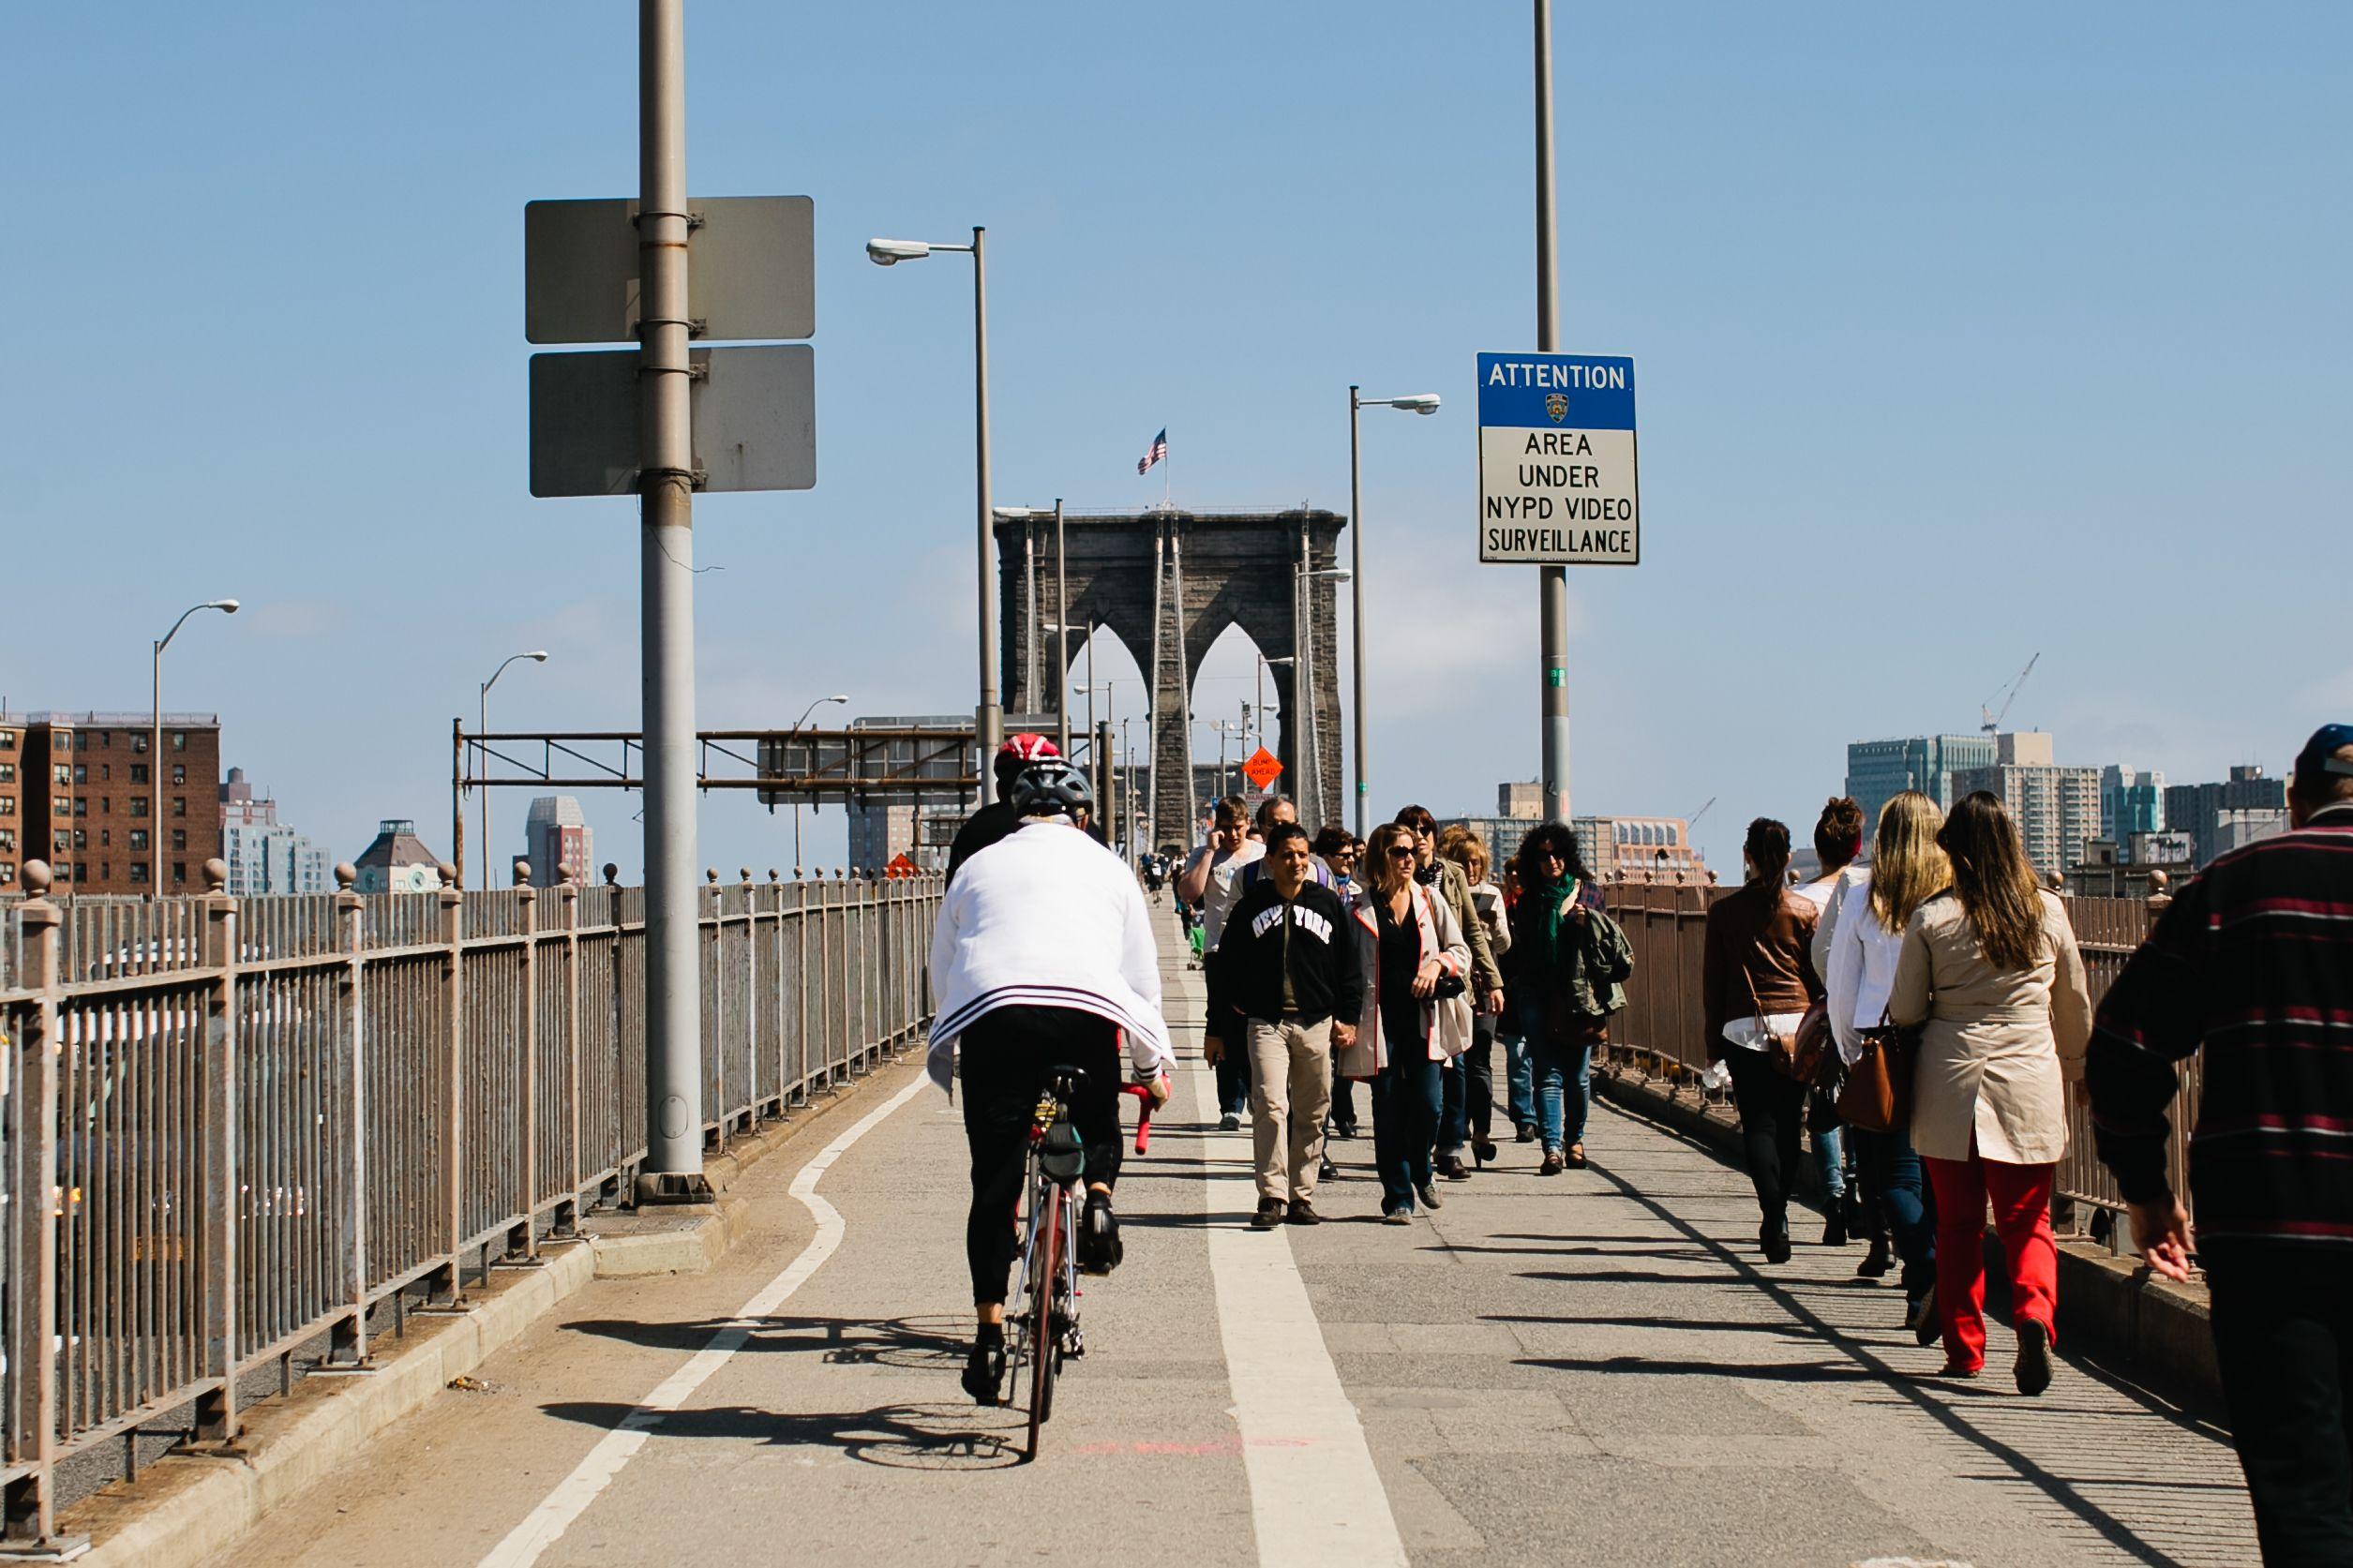 Reason #303 (why we love New York, New York): Bike rides on the Brooklyn Bridge. #Brooklyn #NYC #love #365 #MandarinOriental